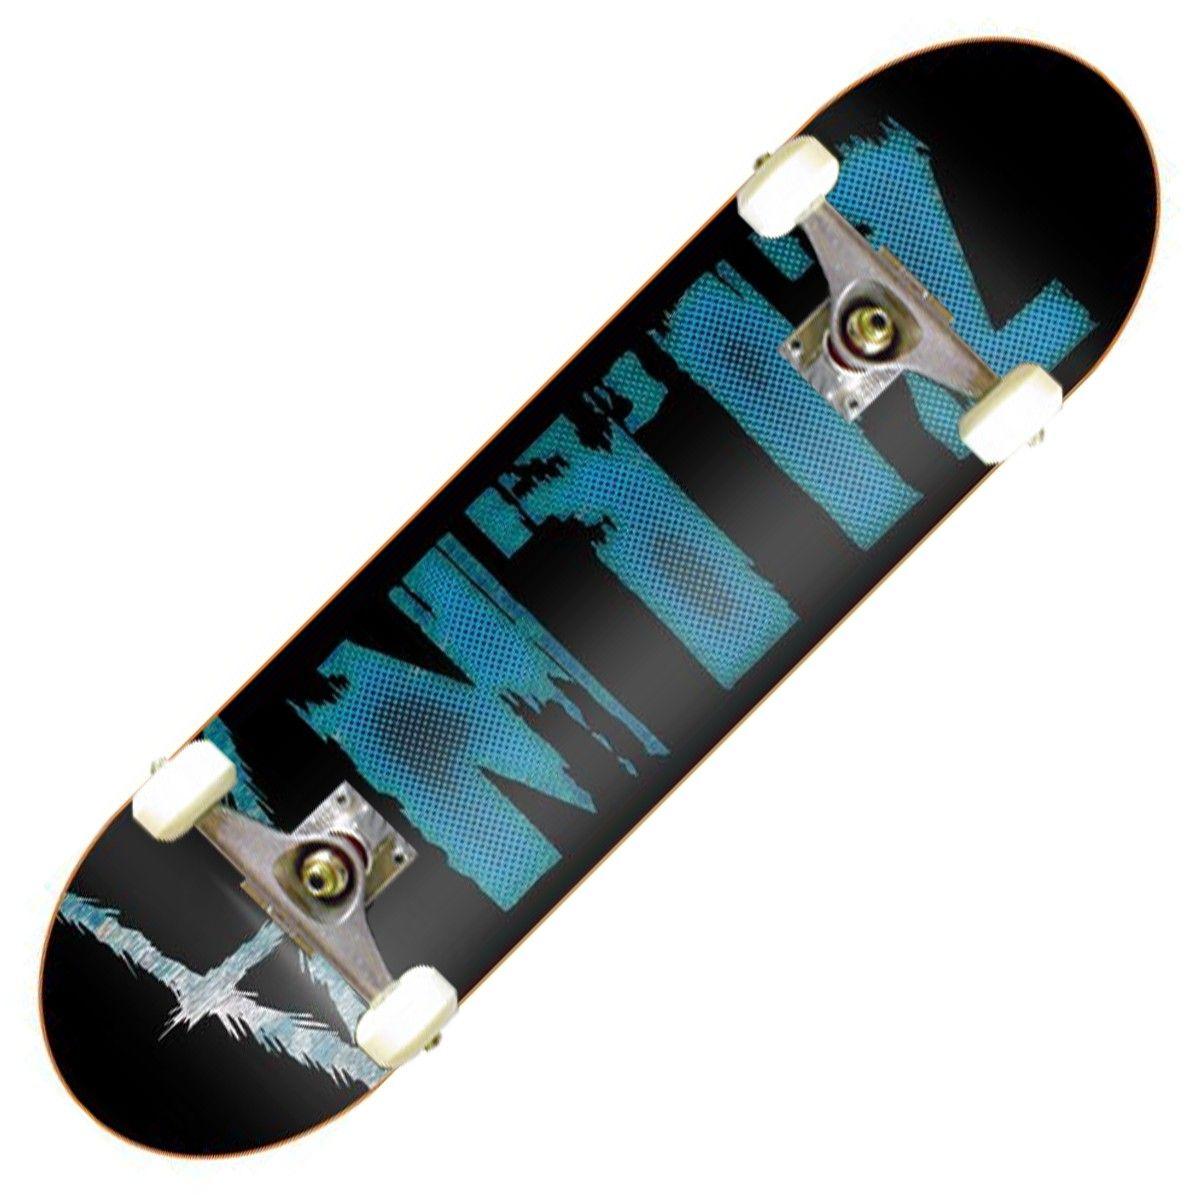 "Board complète Antiz Logo blue 7.875"" 110€ #antiz #skate #skateboard #skateboarding #skates #skater #skateboards #boardcomplete"